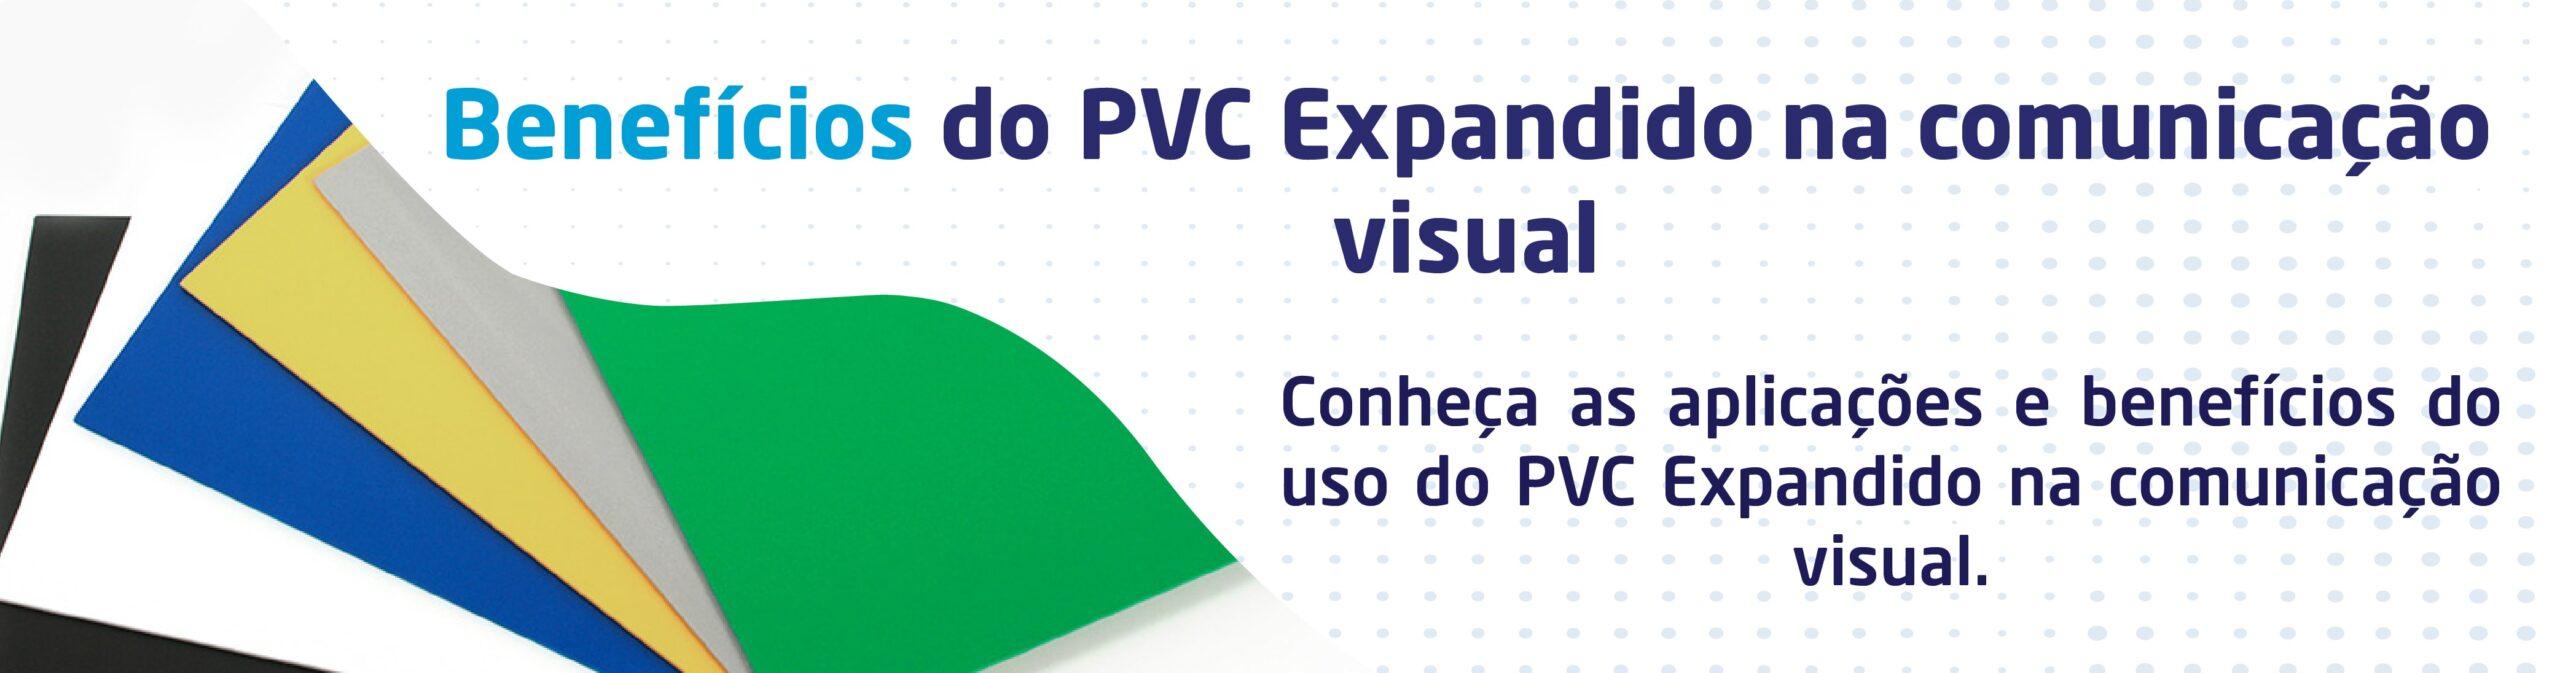 pvc-comunicacao-visual